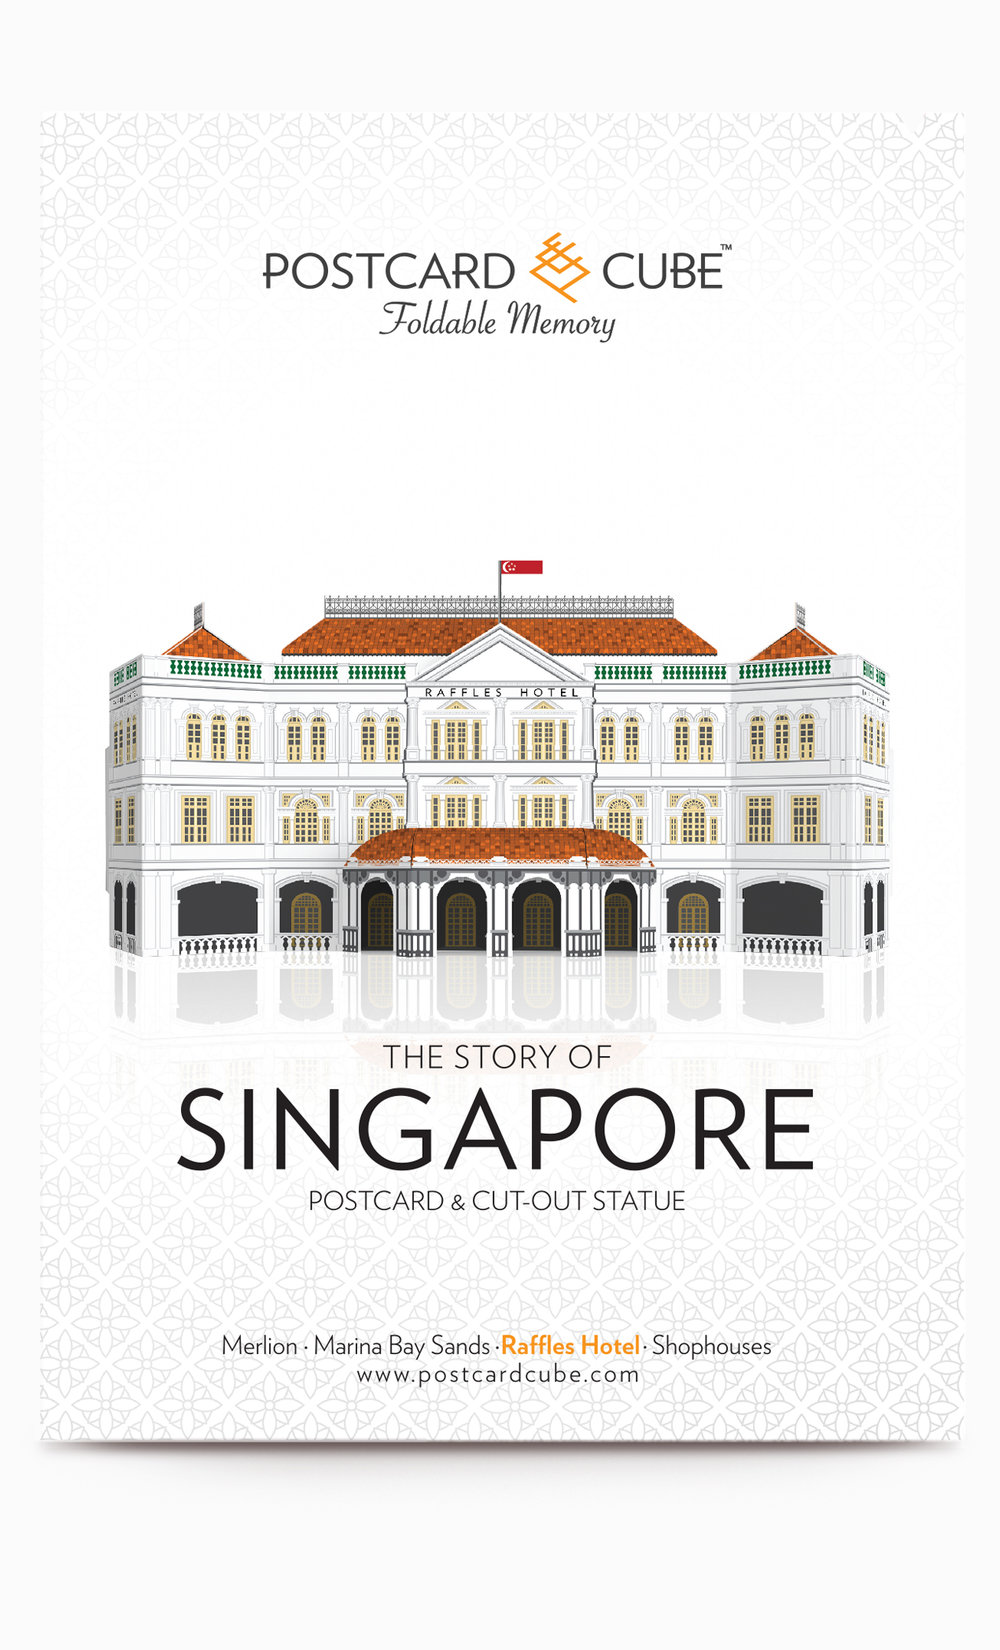 Postcardcube_Singapore_Raffles Hotel